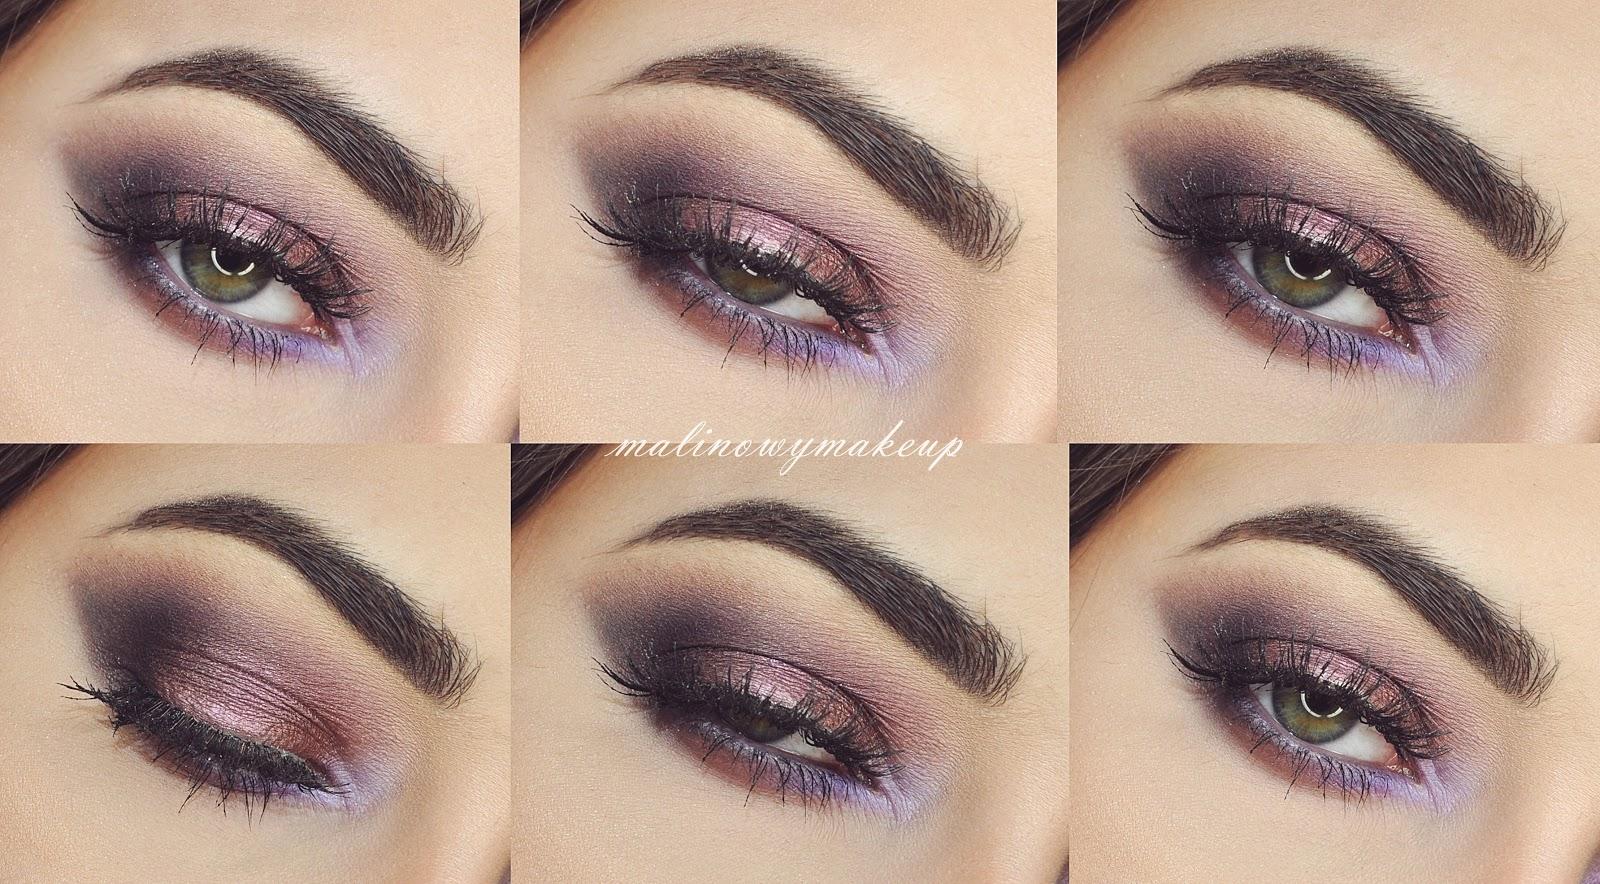 violet purple smokey eyes moky eye makijaż fioletowy fioletowe smokey makijaż do fioletowej sukienki karnawał malinowy makeup chocolate bon bons too faced inglot sweet peach